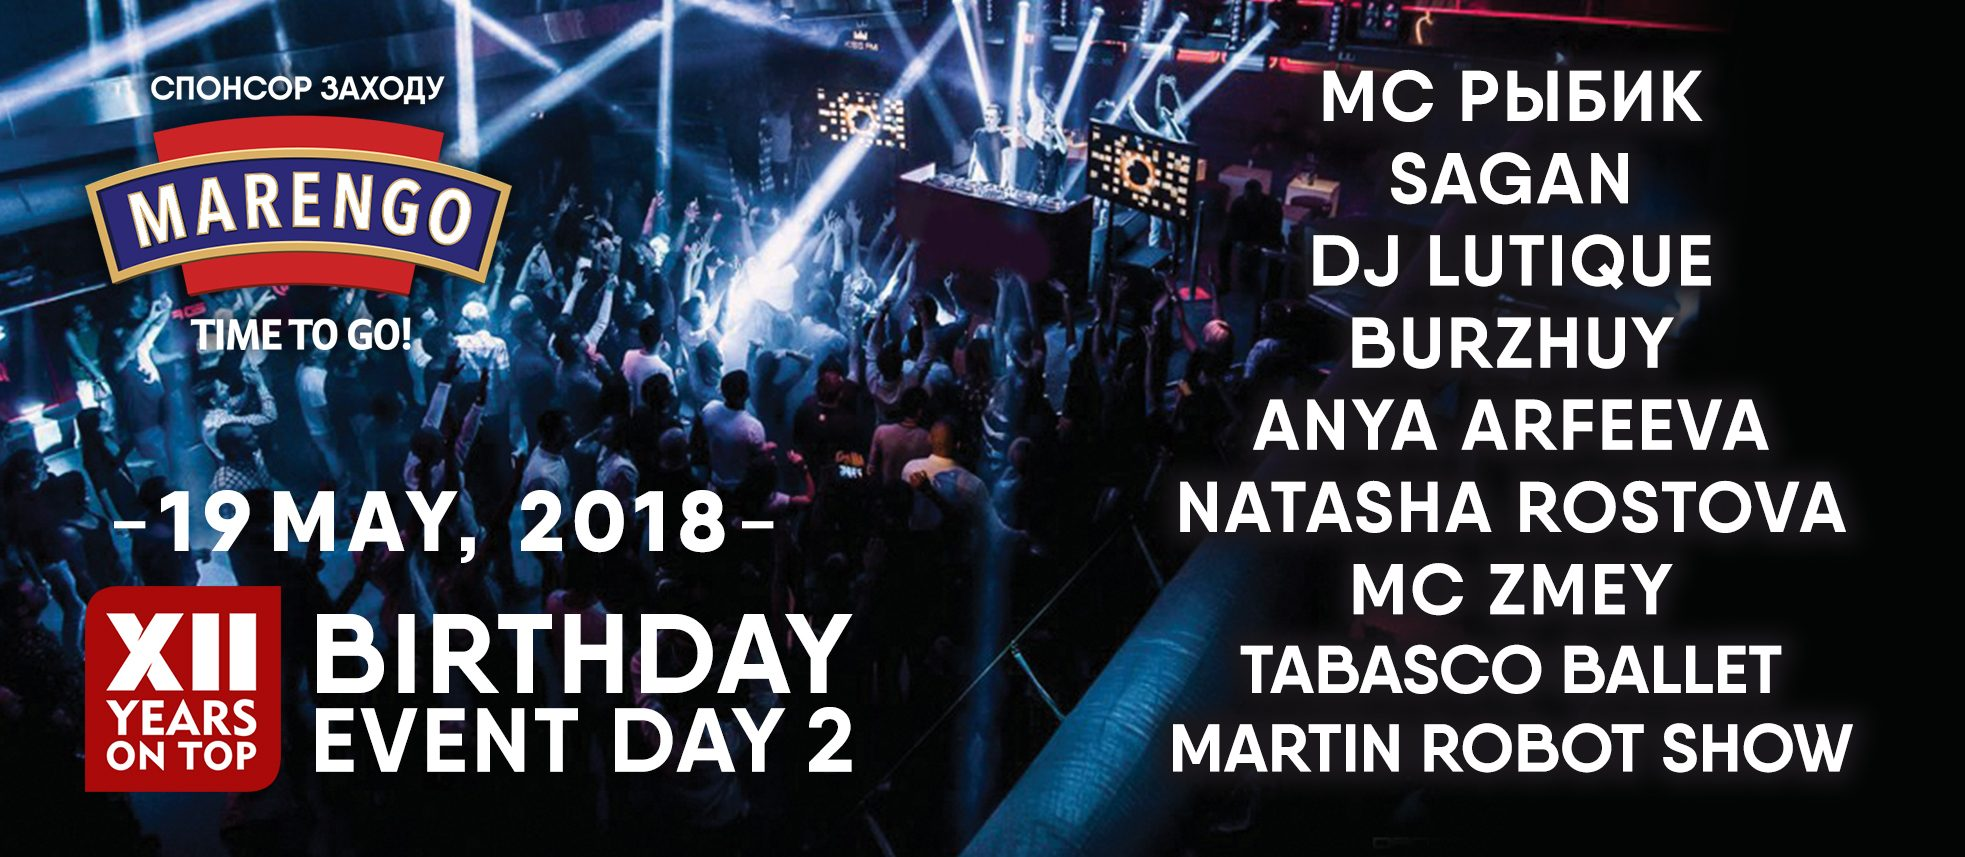 Forsage birthday night! Mc Рыбик, Sagan, Dj Lutique, Anya Arfeeva, Burzhuy, Natasha Rostova, Tabasco ballet & Martin robot show